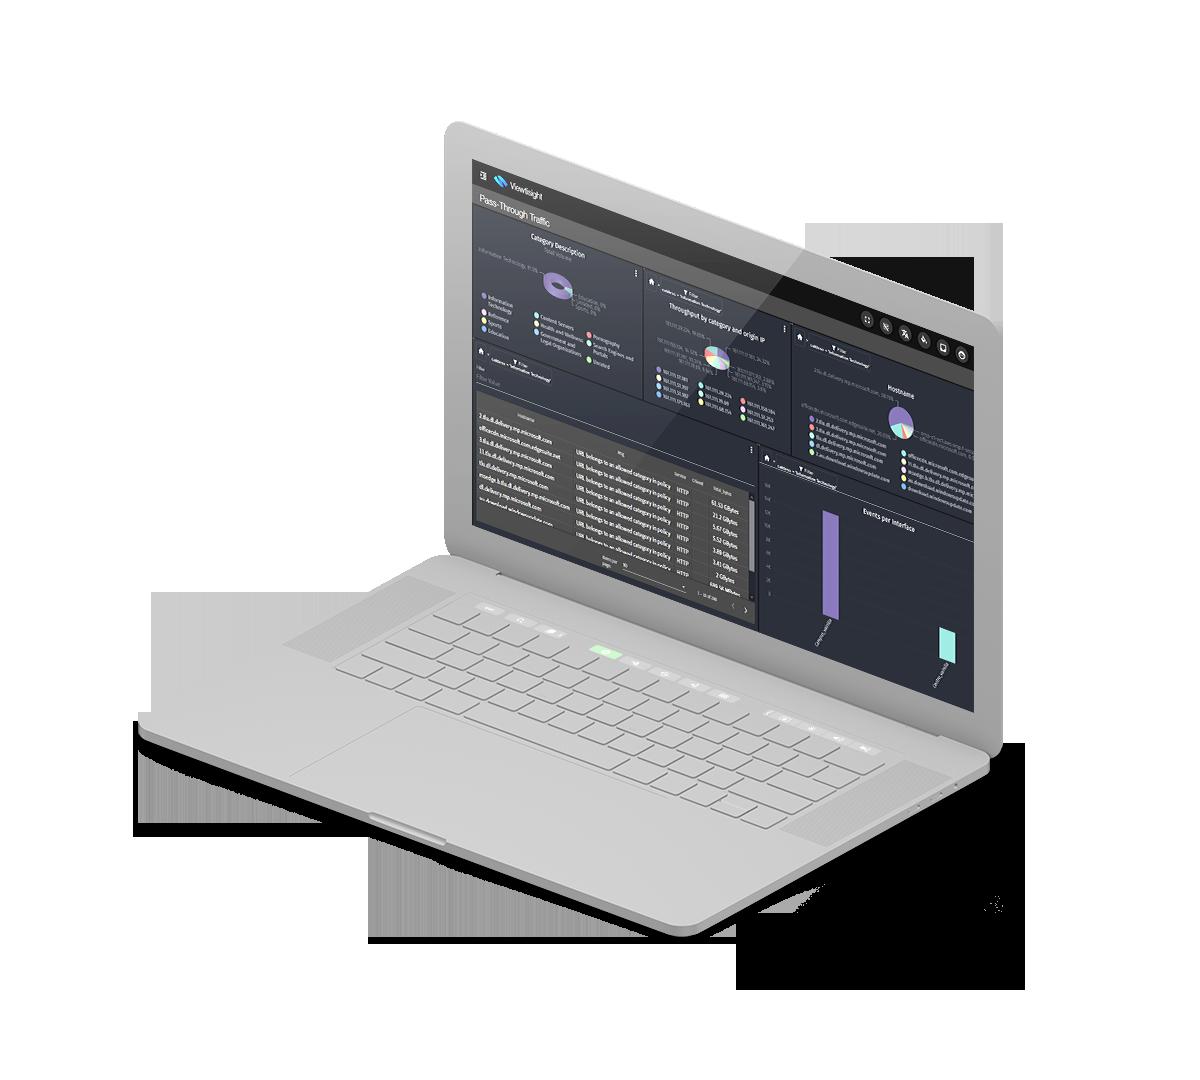 Syslog Server logger dashboard